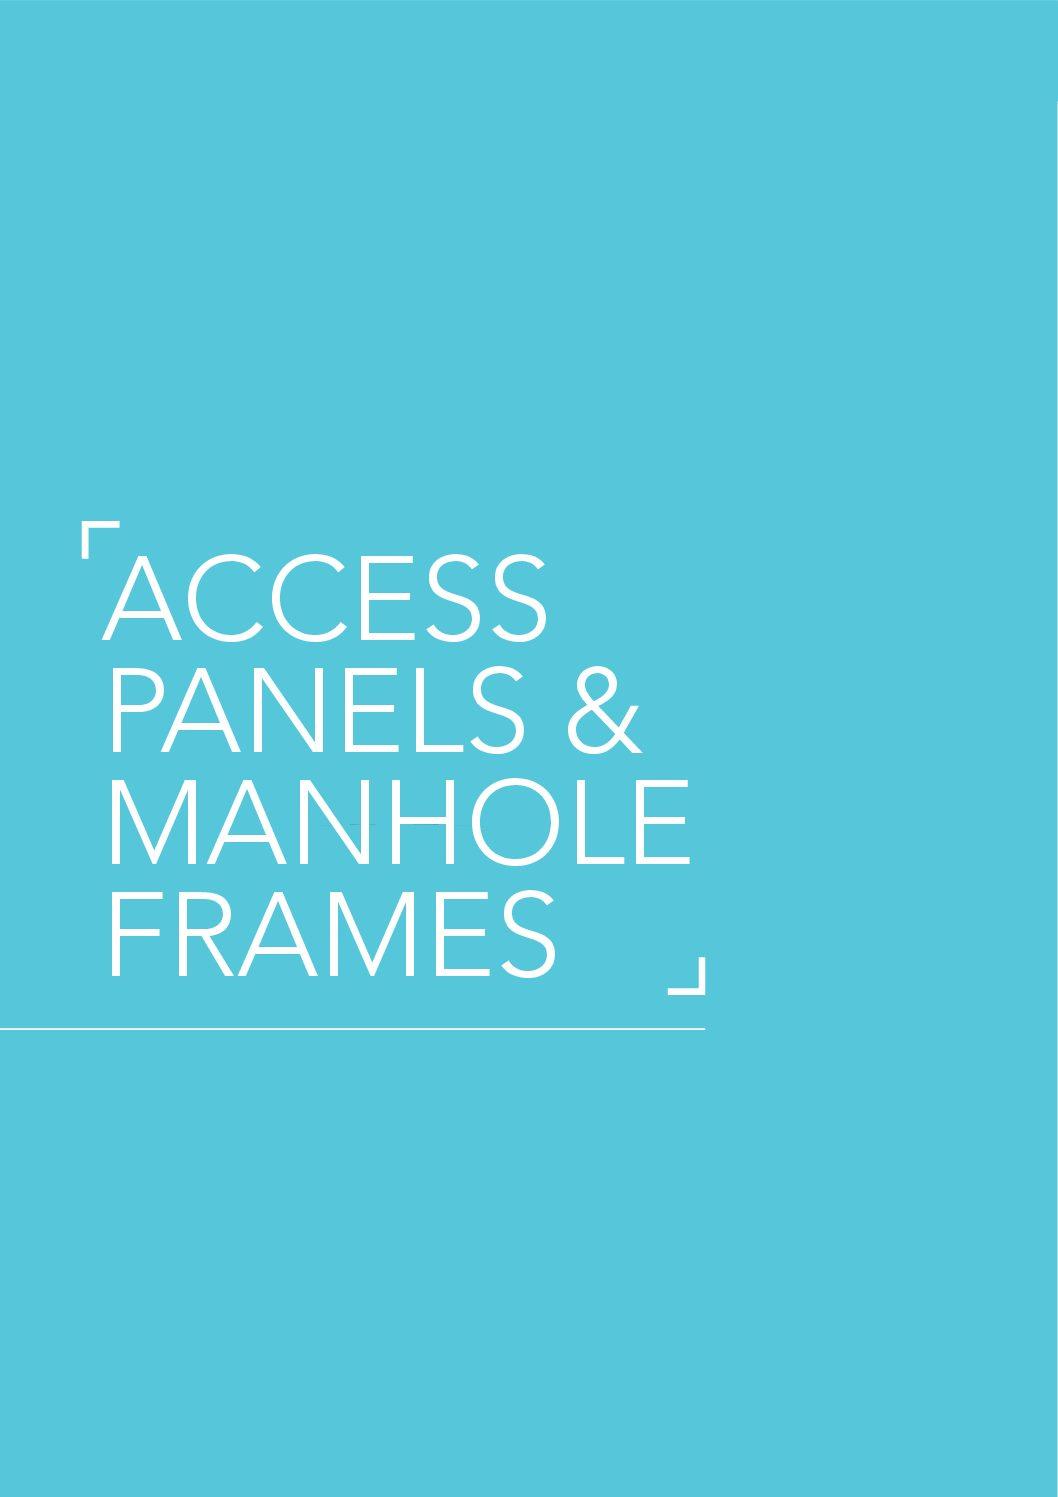 Access Panels & Manhole Frames